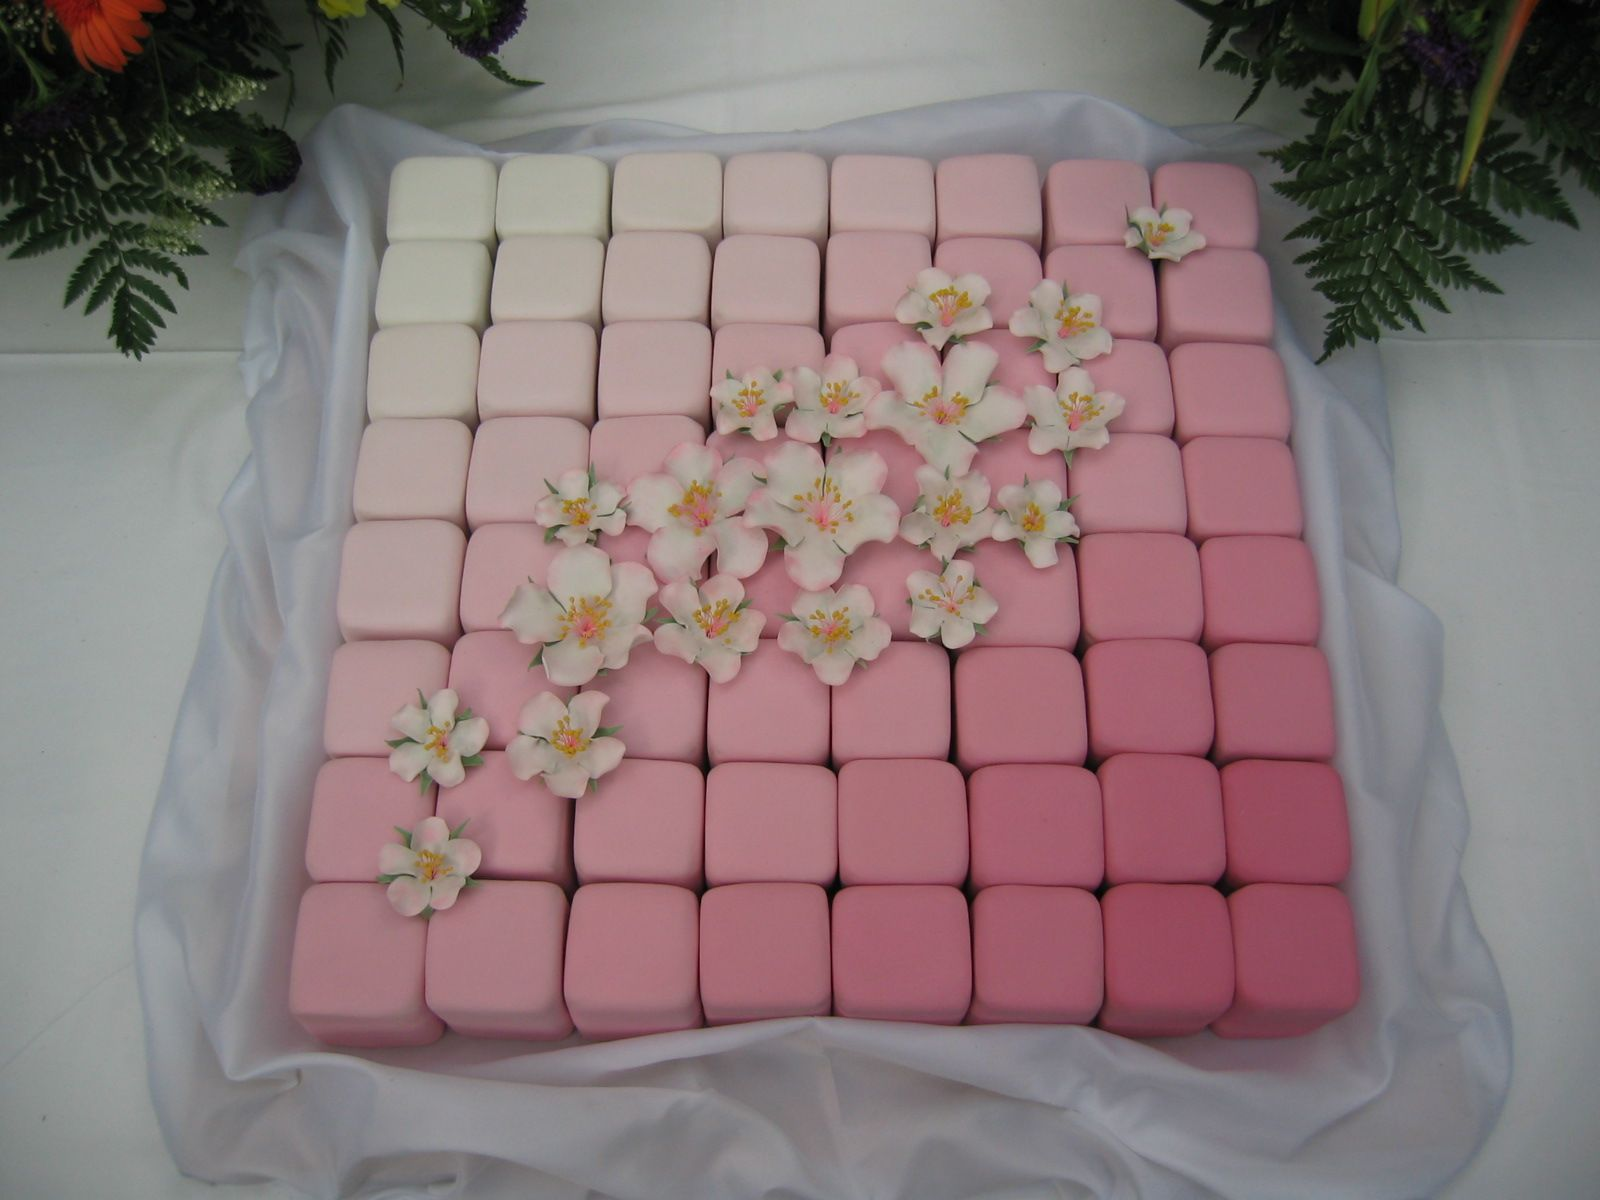 Graduated pink individual wedding cakes